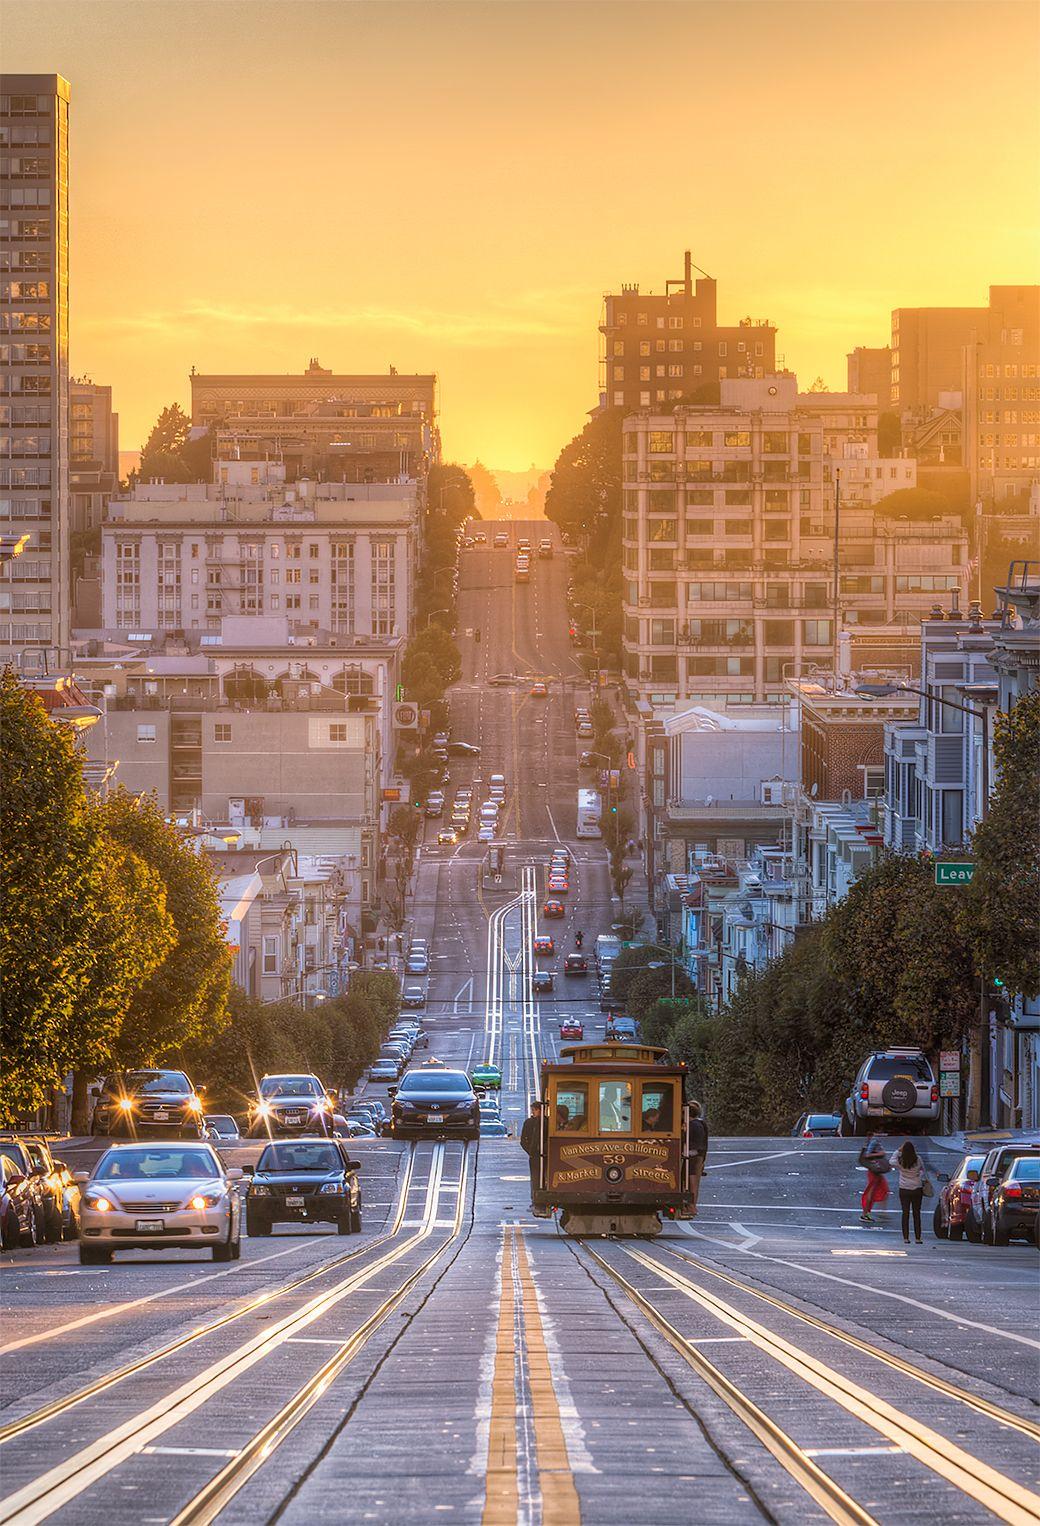 70 Parallax Ios 7 Wallpapers For Iphone 5 Shayatik Com Travel Around The World California Tumblr Travel